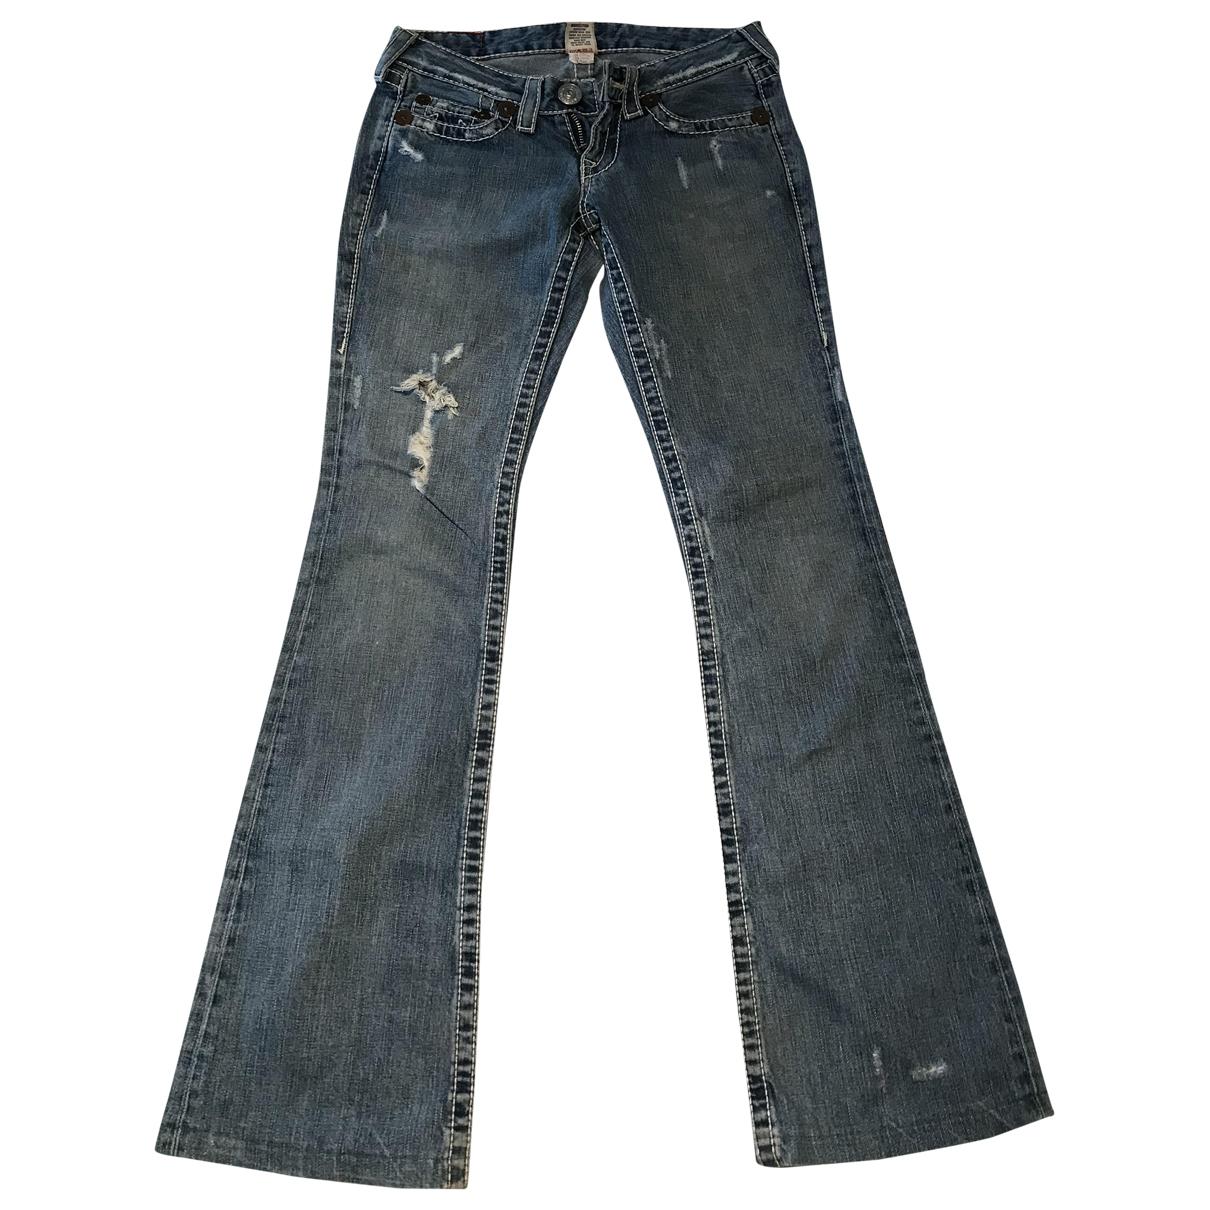 True Religion \N Blue Denim - Jeans Jeans for Women 26 US